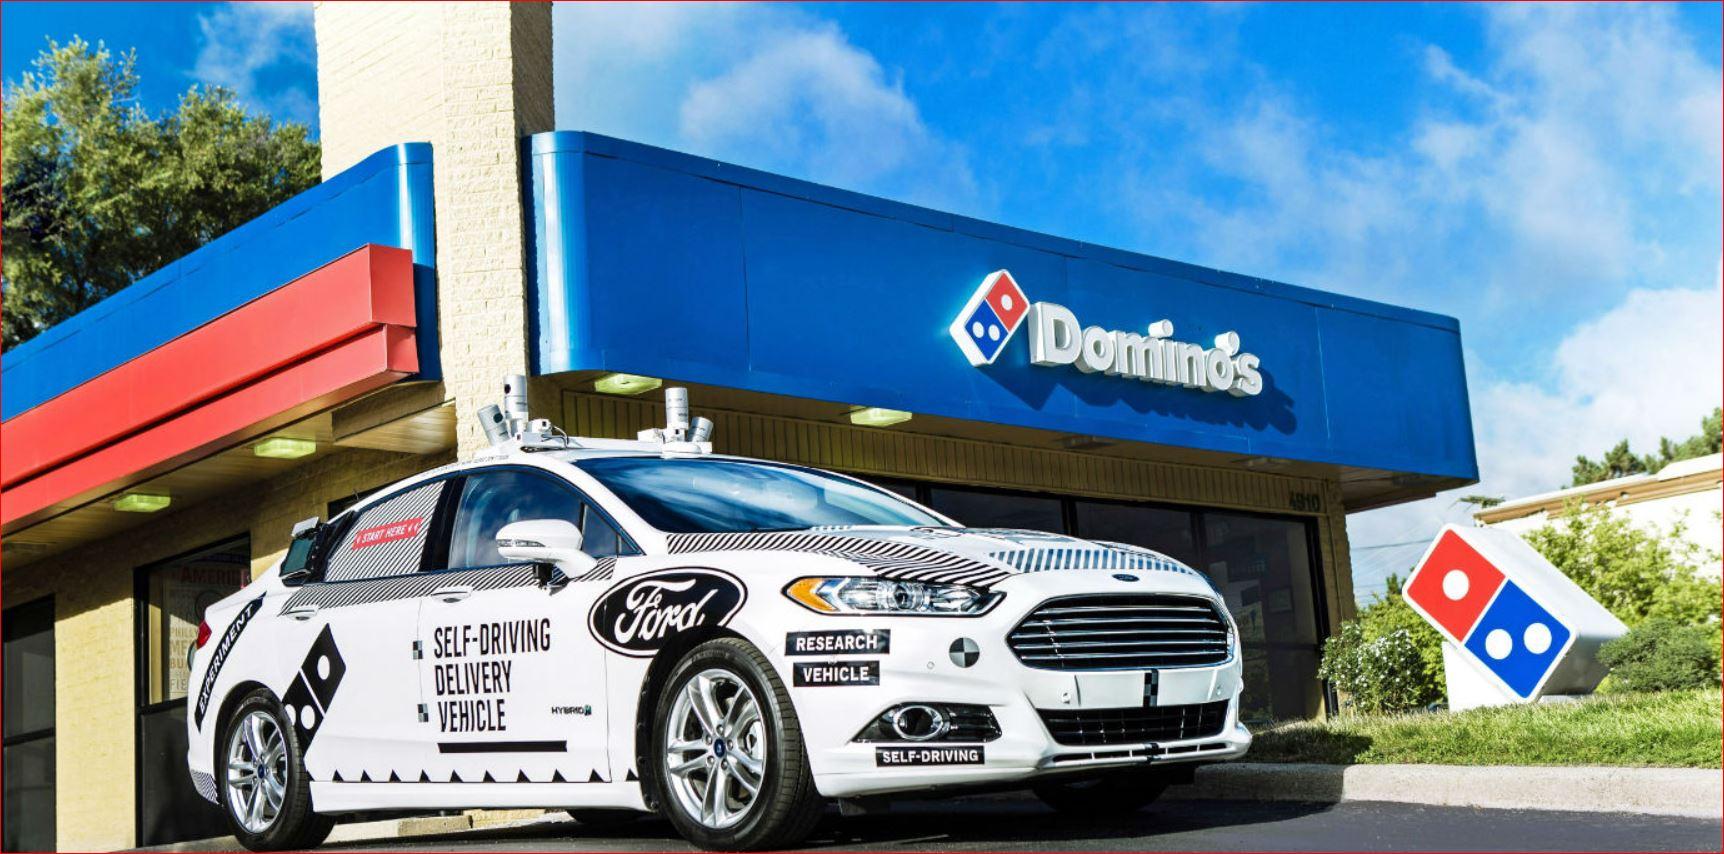 Domino's Pizza Guest Feedback Survey